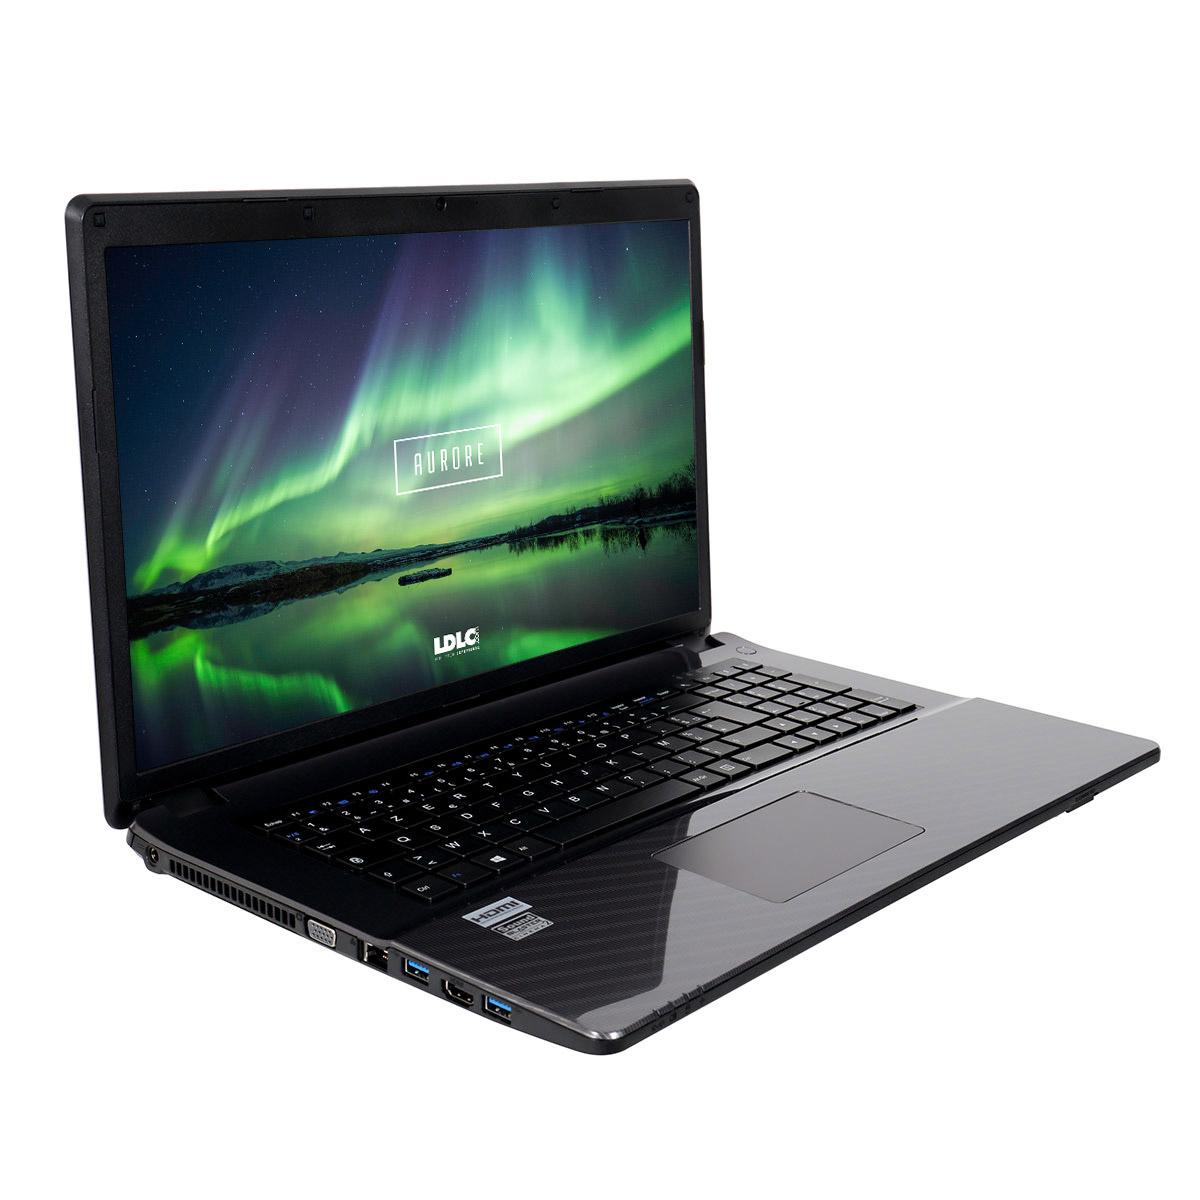 "PC portable LDLC Aurore Ci7P-8-S10 Intel Core i7-6700HQ 8 Go SSD 1 To 17.3"" LED Full HD Graveur DVD Wi-Fi N/Bluetooth Webcam (sans OS)"